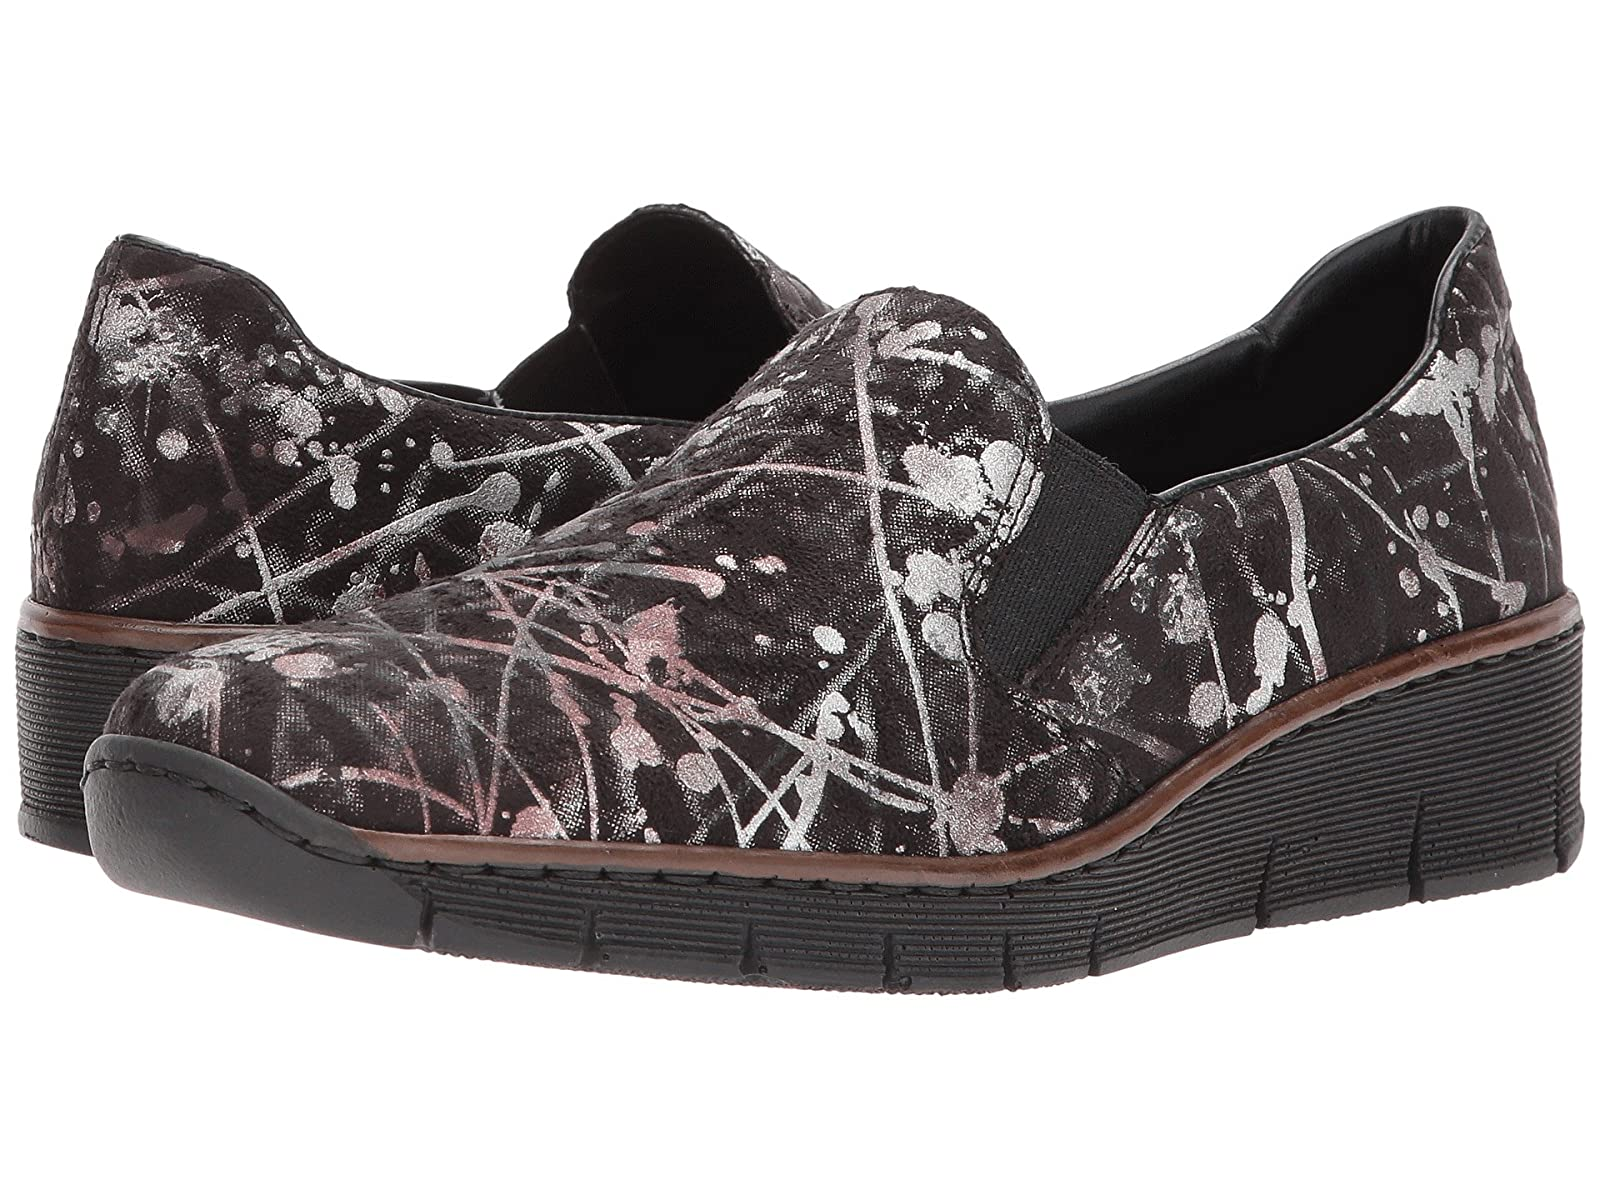 Rieker 53766 Doris 66Cheap and distinctive eye-catching shoes